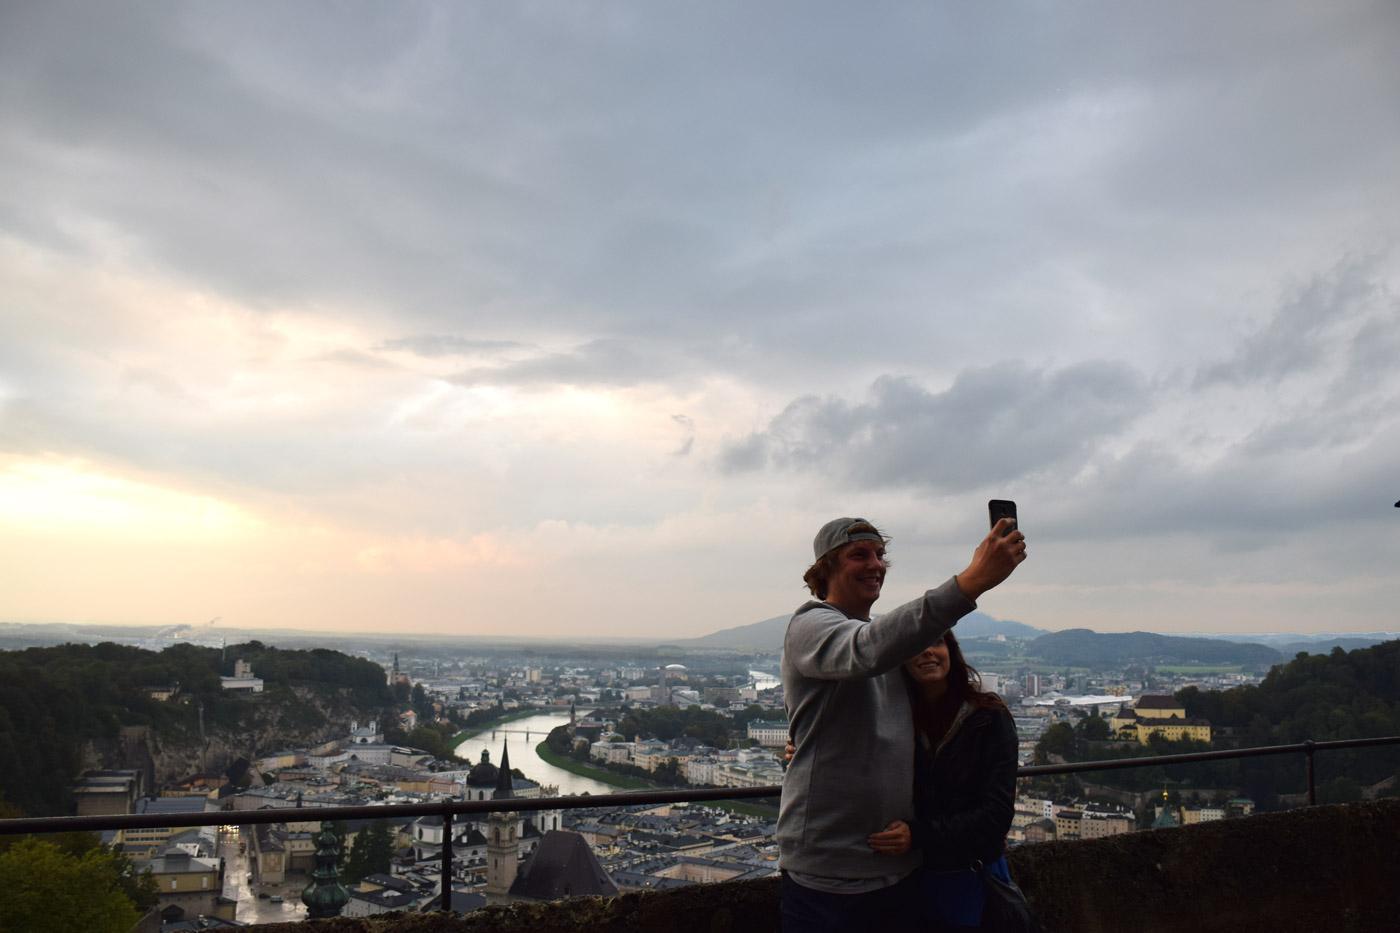 An old school selfie attemptoverlooking Salzburg from acastle.